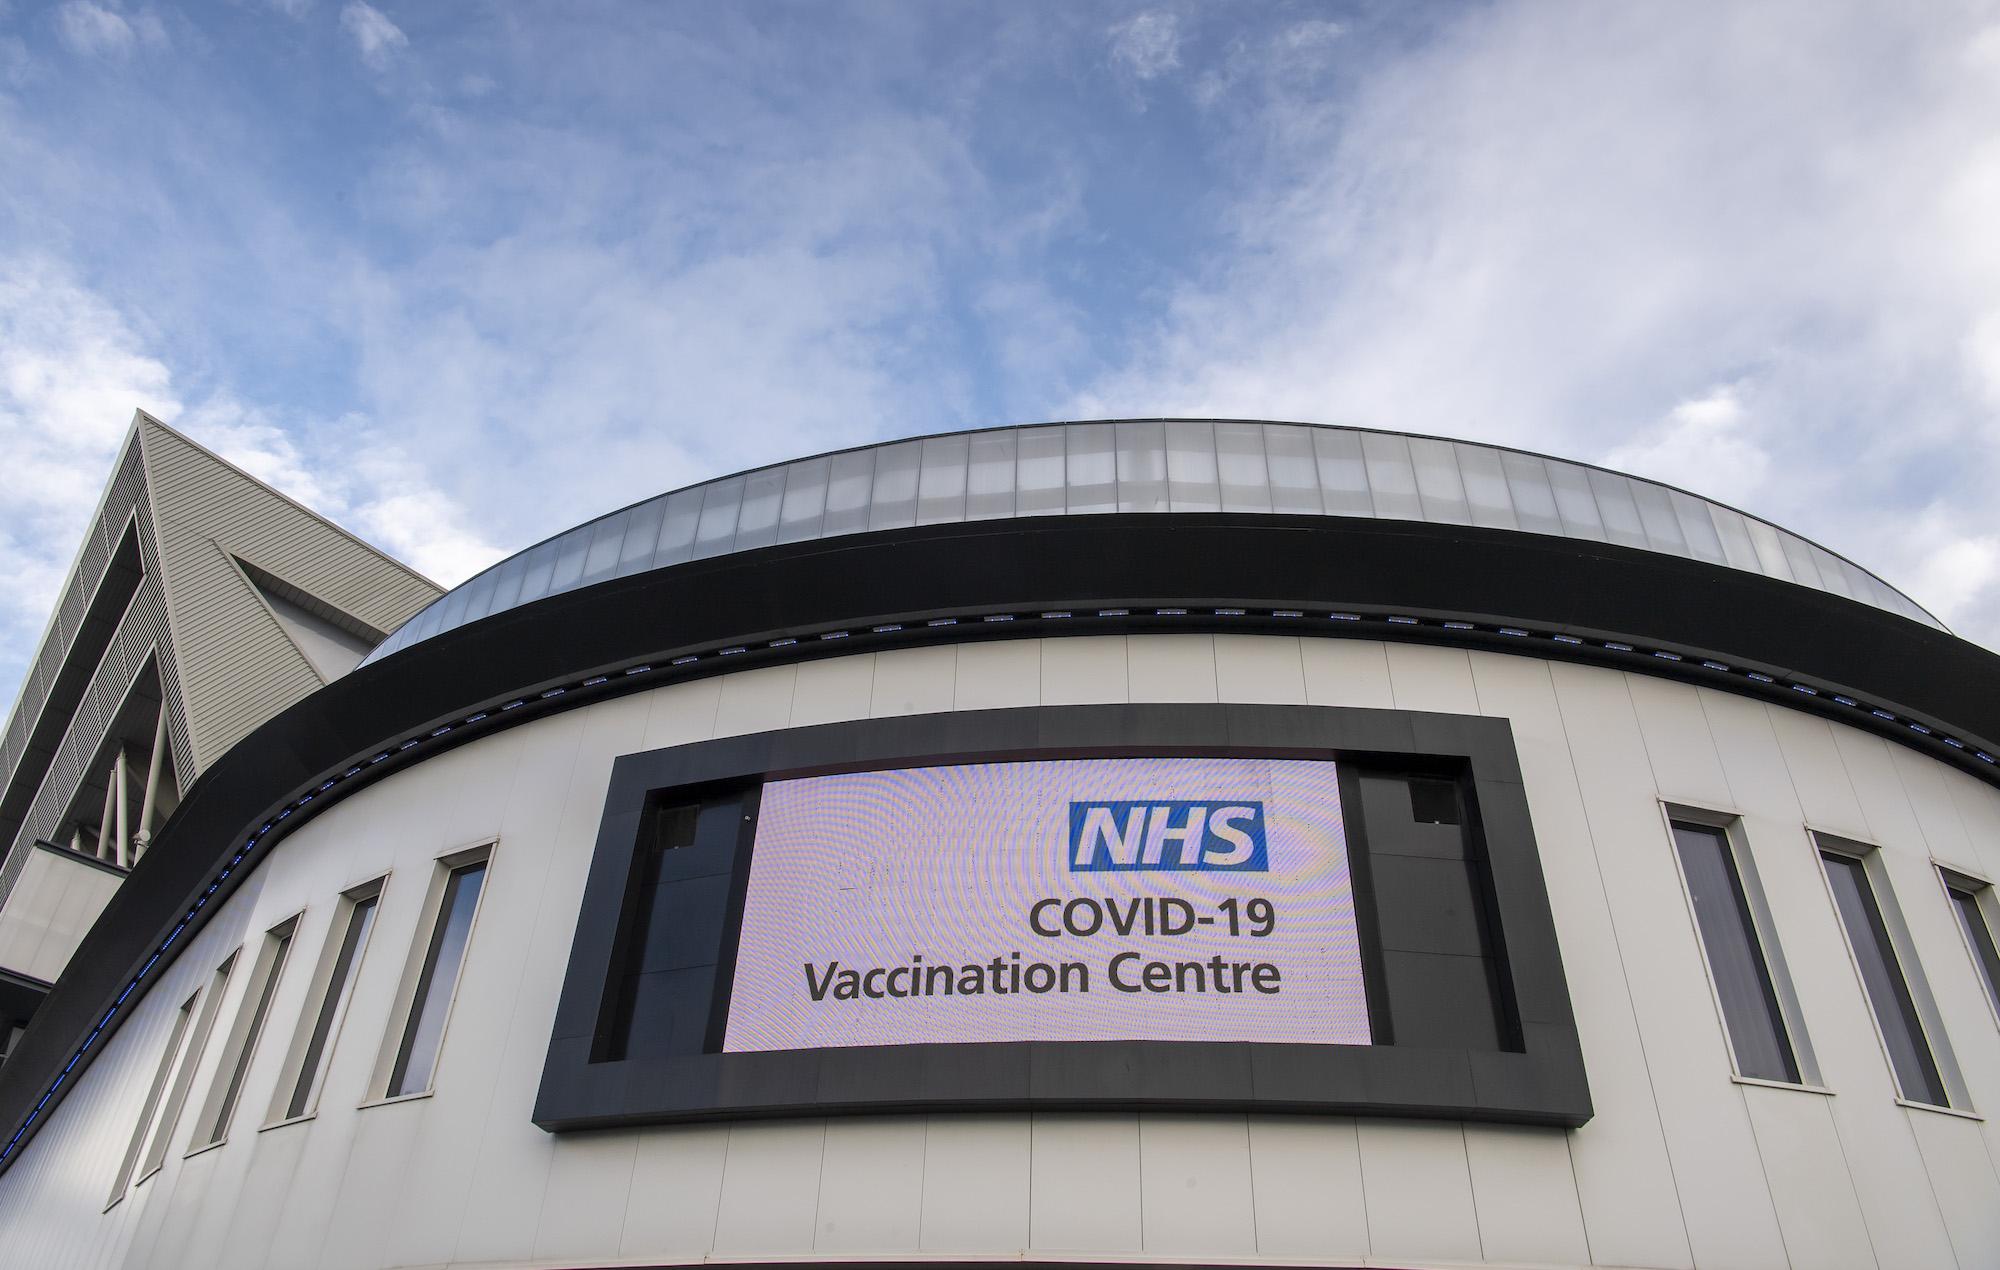 Coronavirus vaccination centre